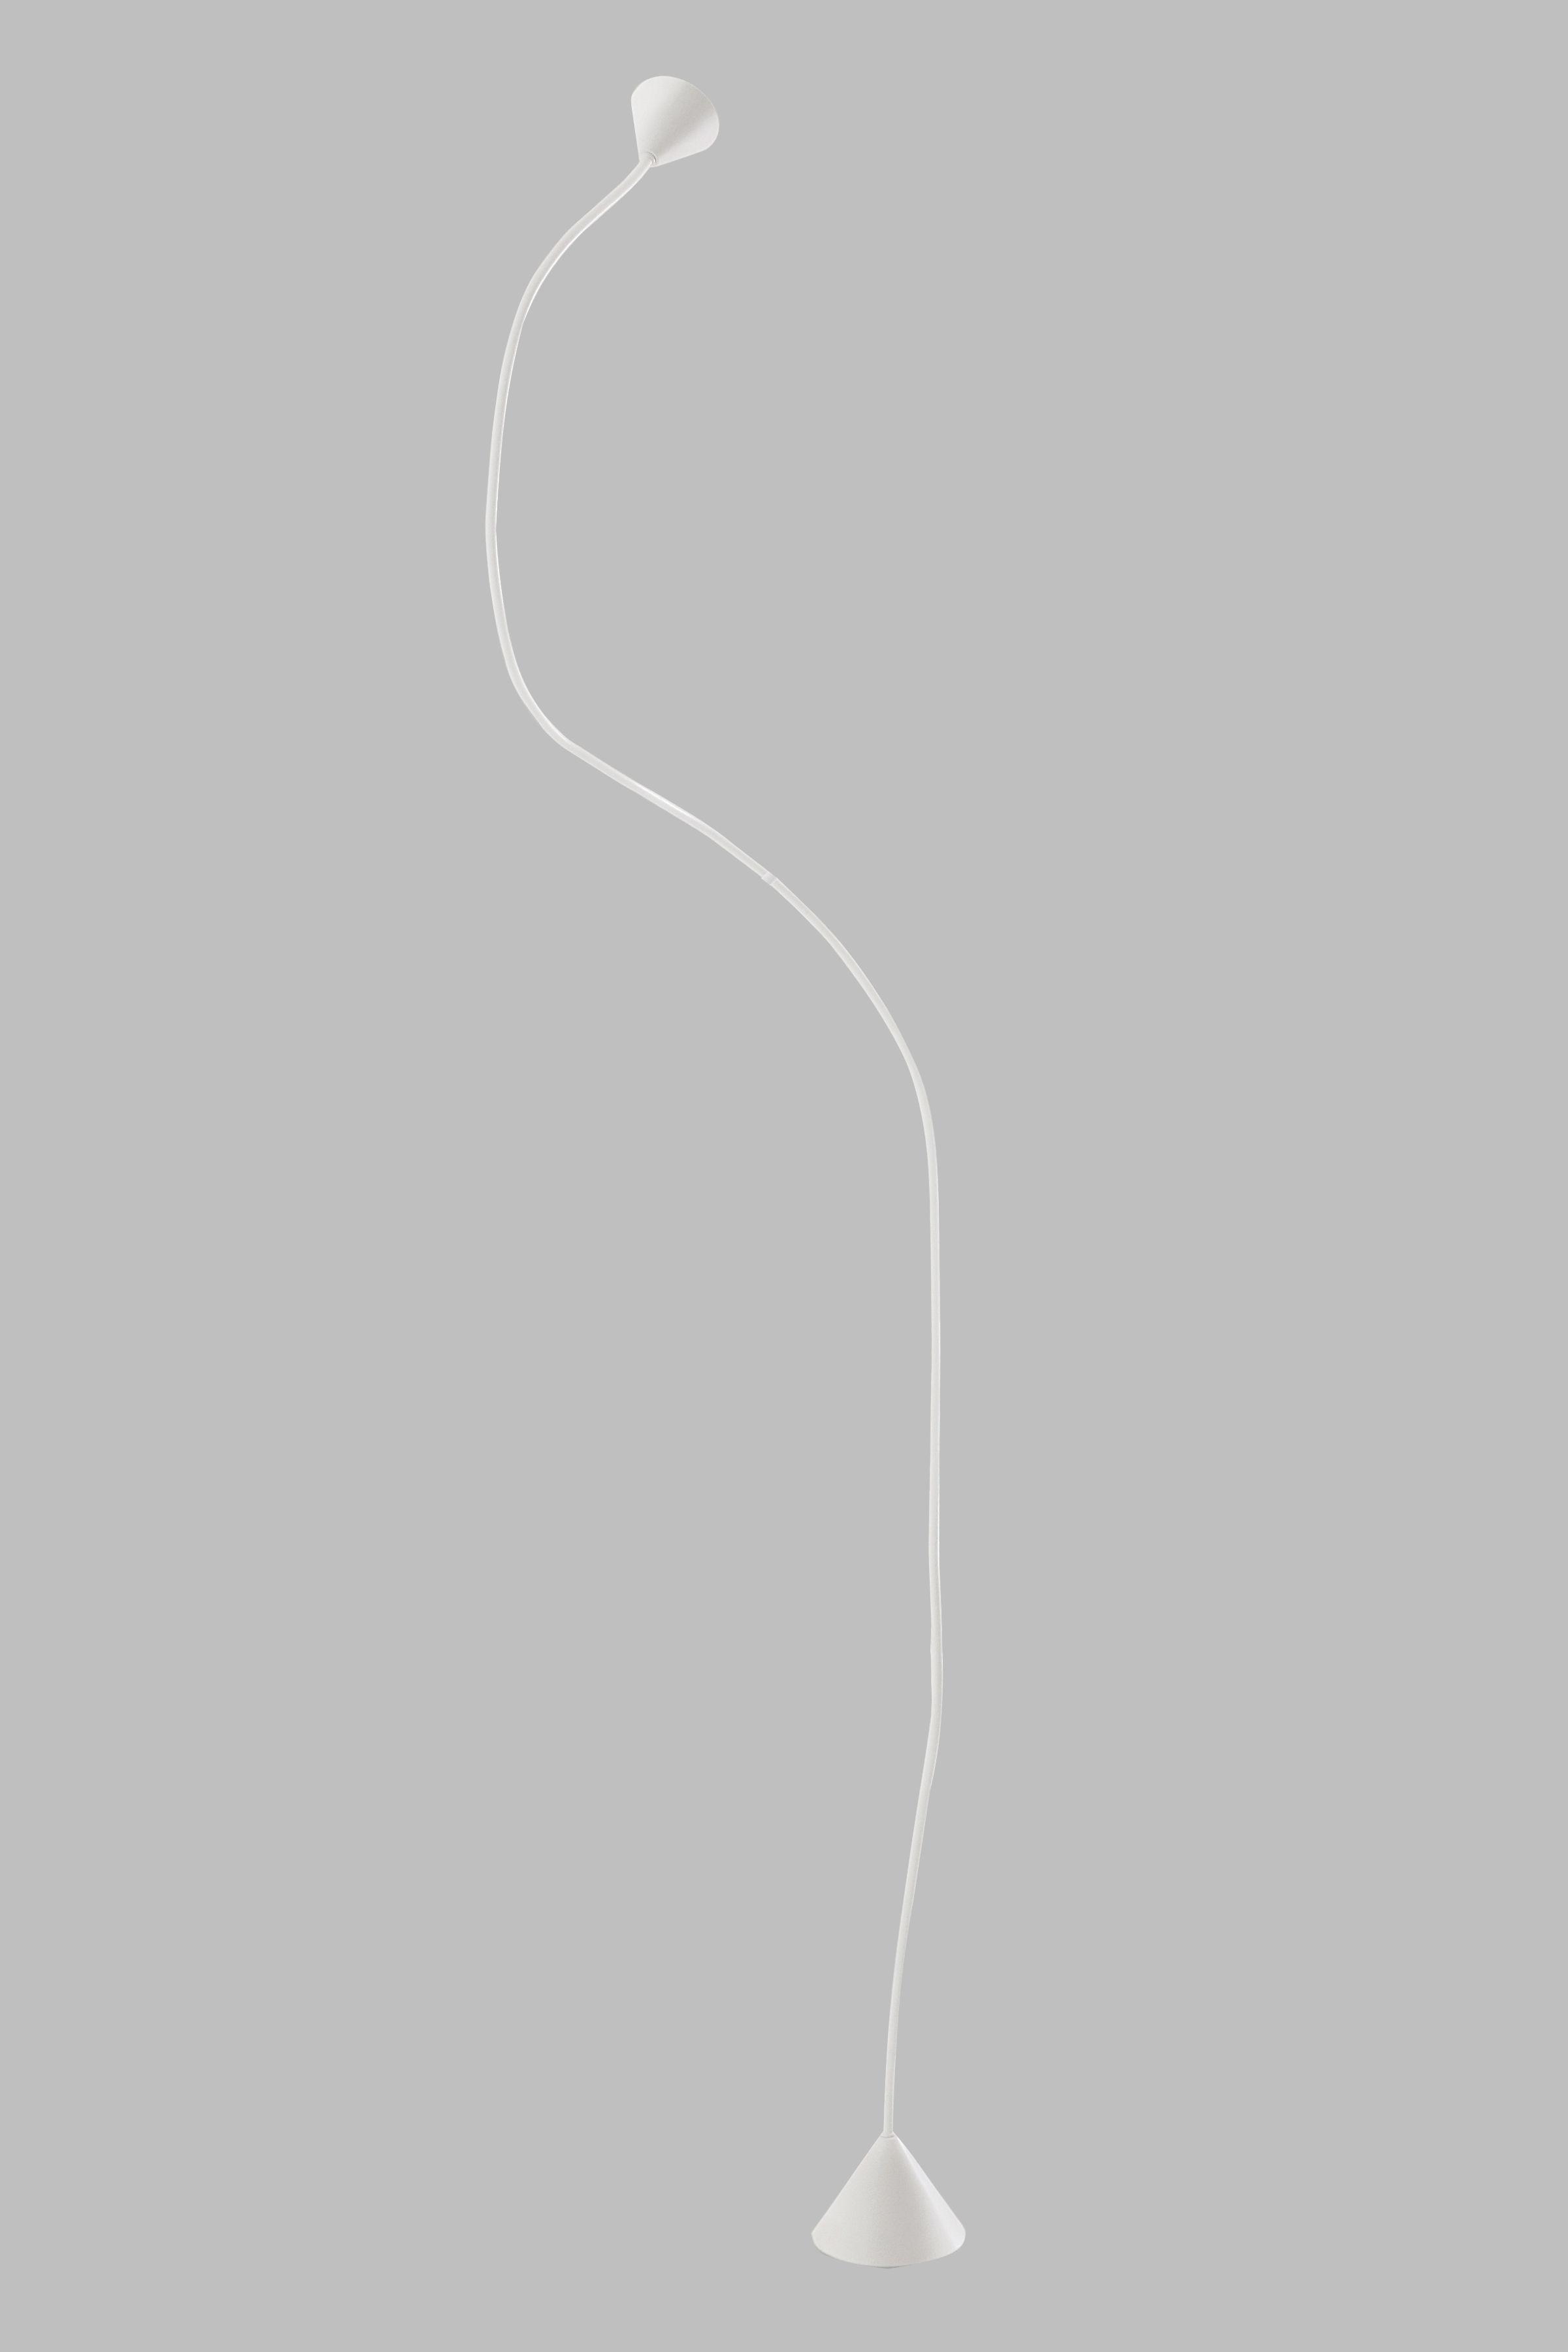 Lighting - Floor lamps - Papiro Floor lamp - flexible H 270 cm by Pallucco - H 270 cm - White - Copper